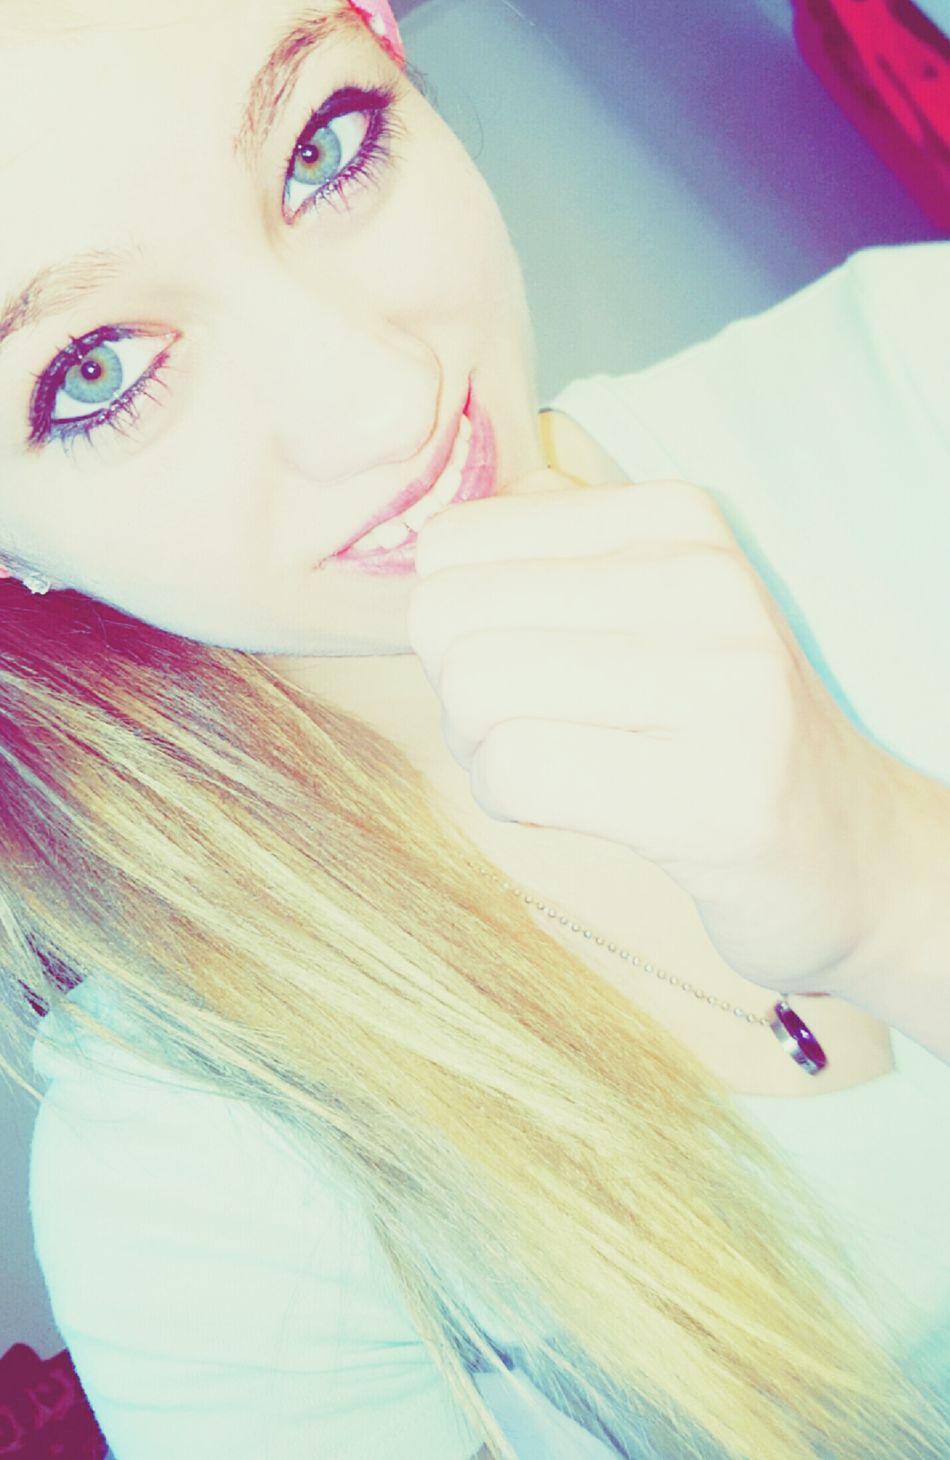 This Week On Eyeem My Eyes <3 My Eye Color Looks Cool !  Week On Eyeem The Photojournalist - 2016 EyeEm Awards Love This Picture. Eyeem Market I Love You ! EyeEm Gallery Pretty Eyes <3  Green And Blue EyeEm Best Edits Keep Smiling Snapshots Of Life Soon To Be Fiance Army Wife Things I Like Eye Photography